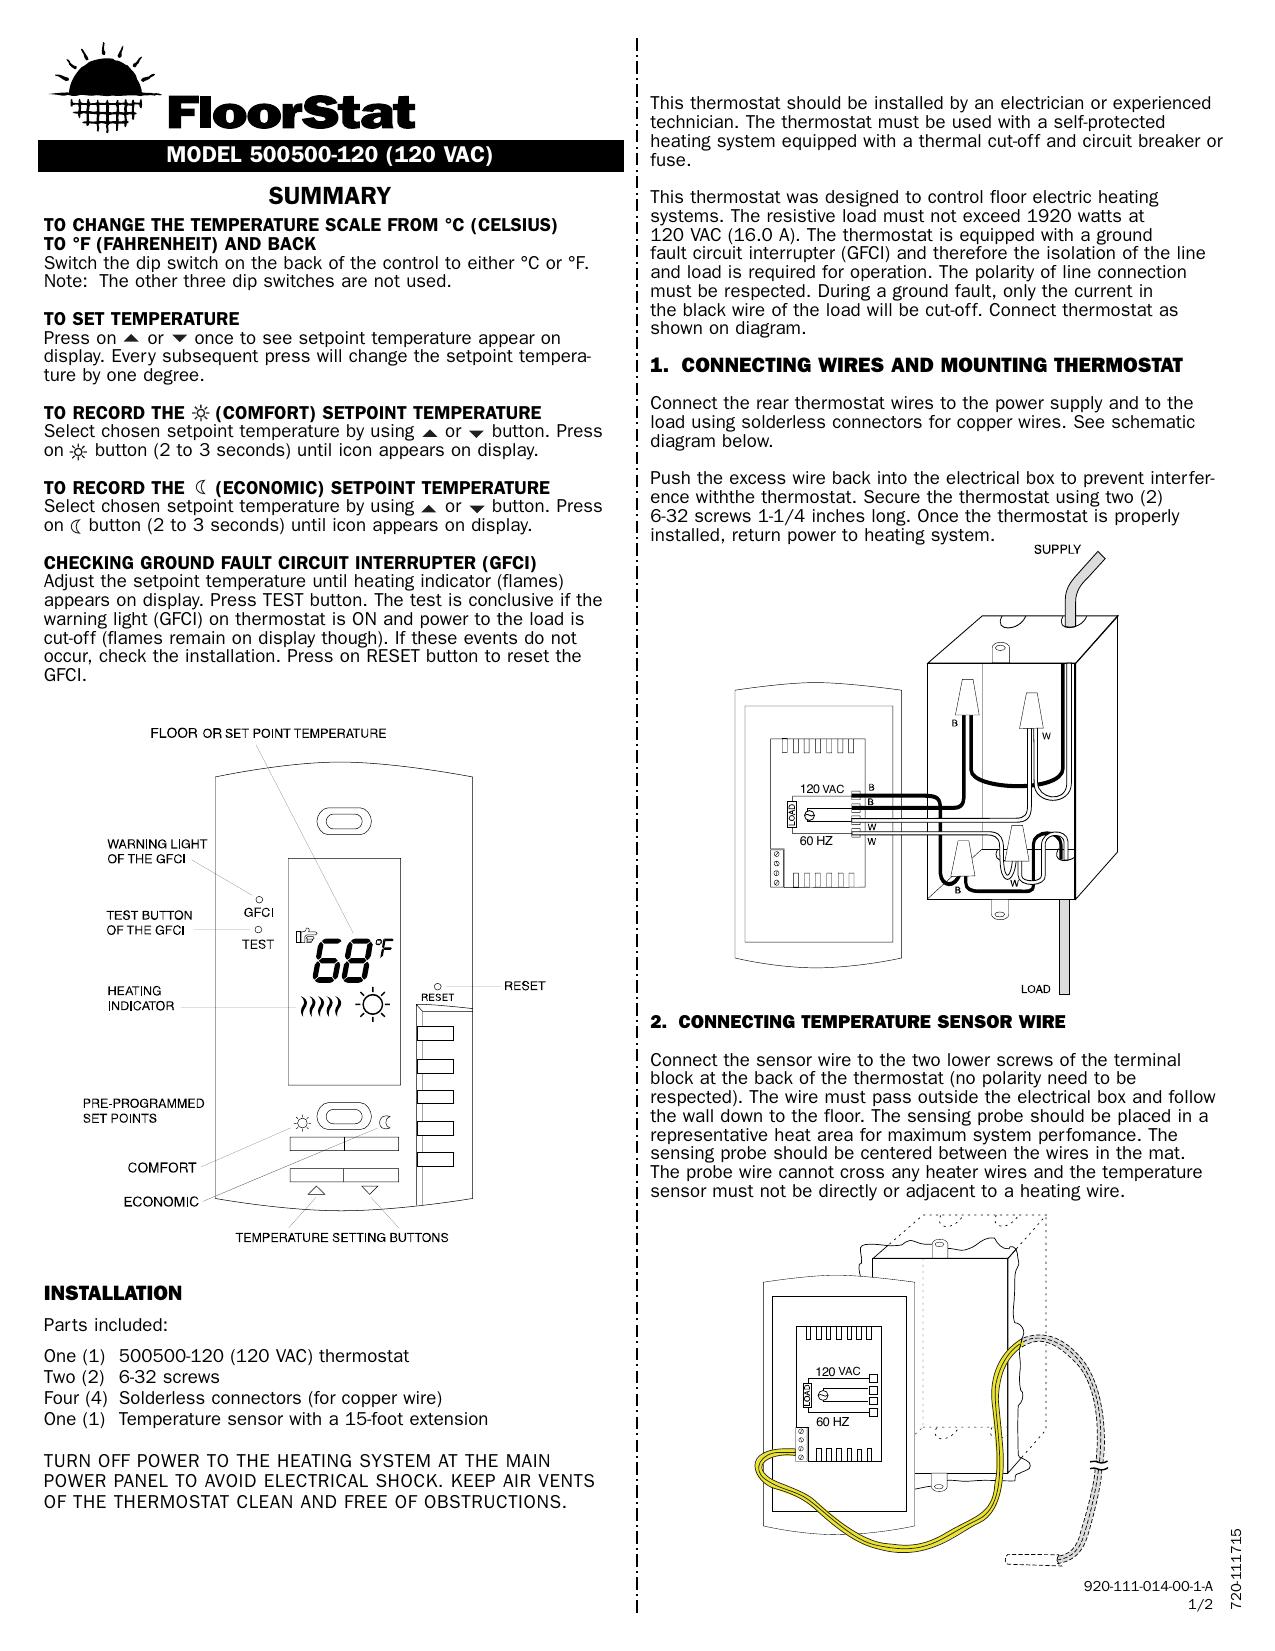 wiring gfi schematic installation view manual warmyourfloor manualzz  view manual warmyourfloor manualzz